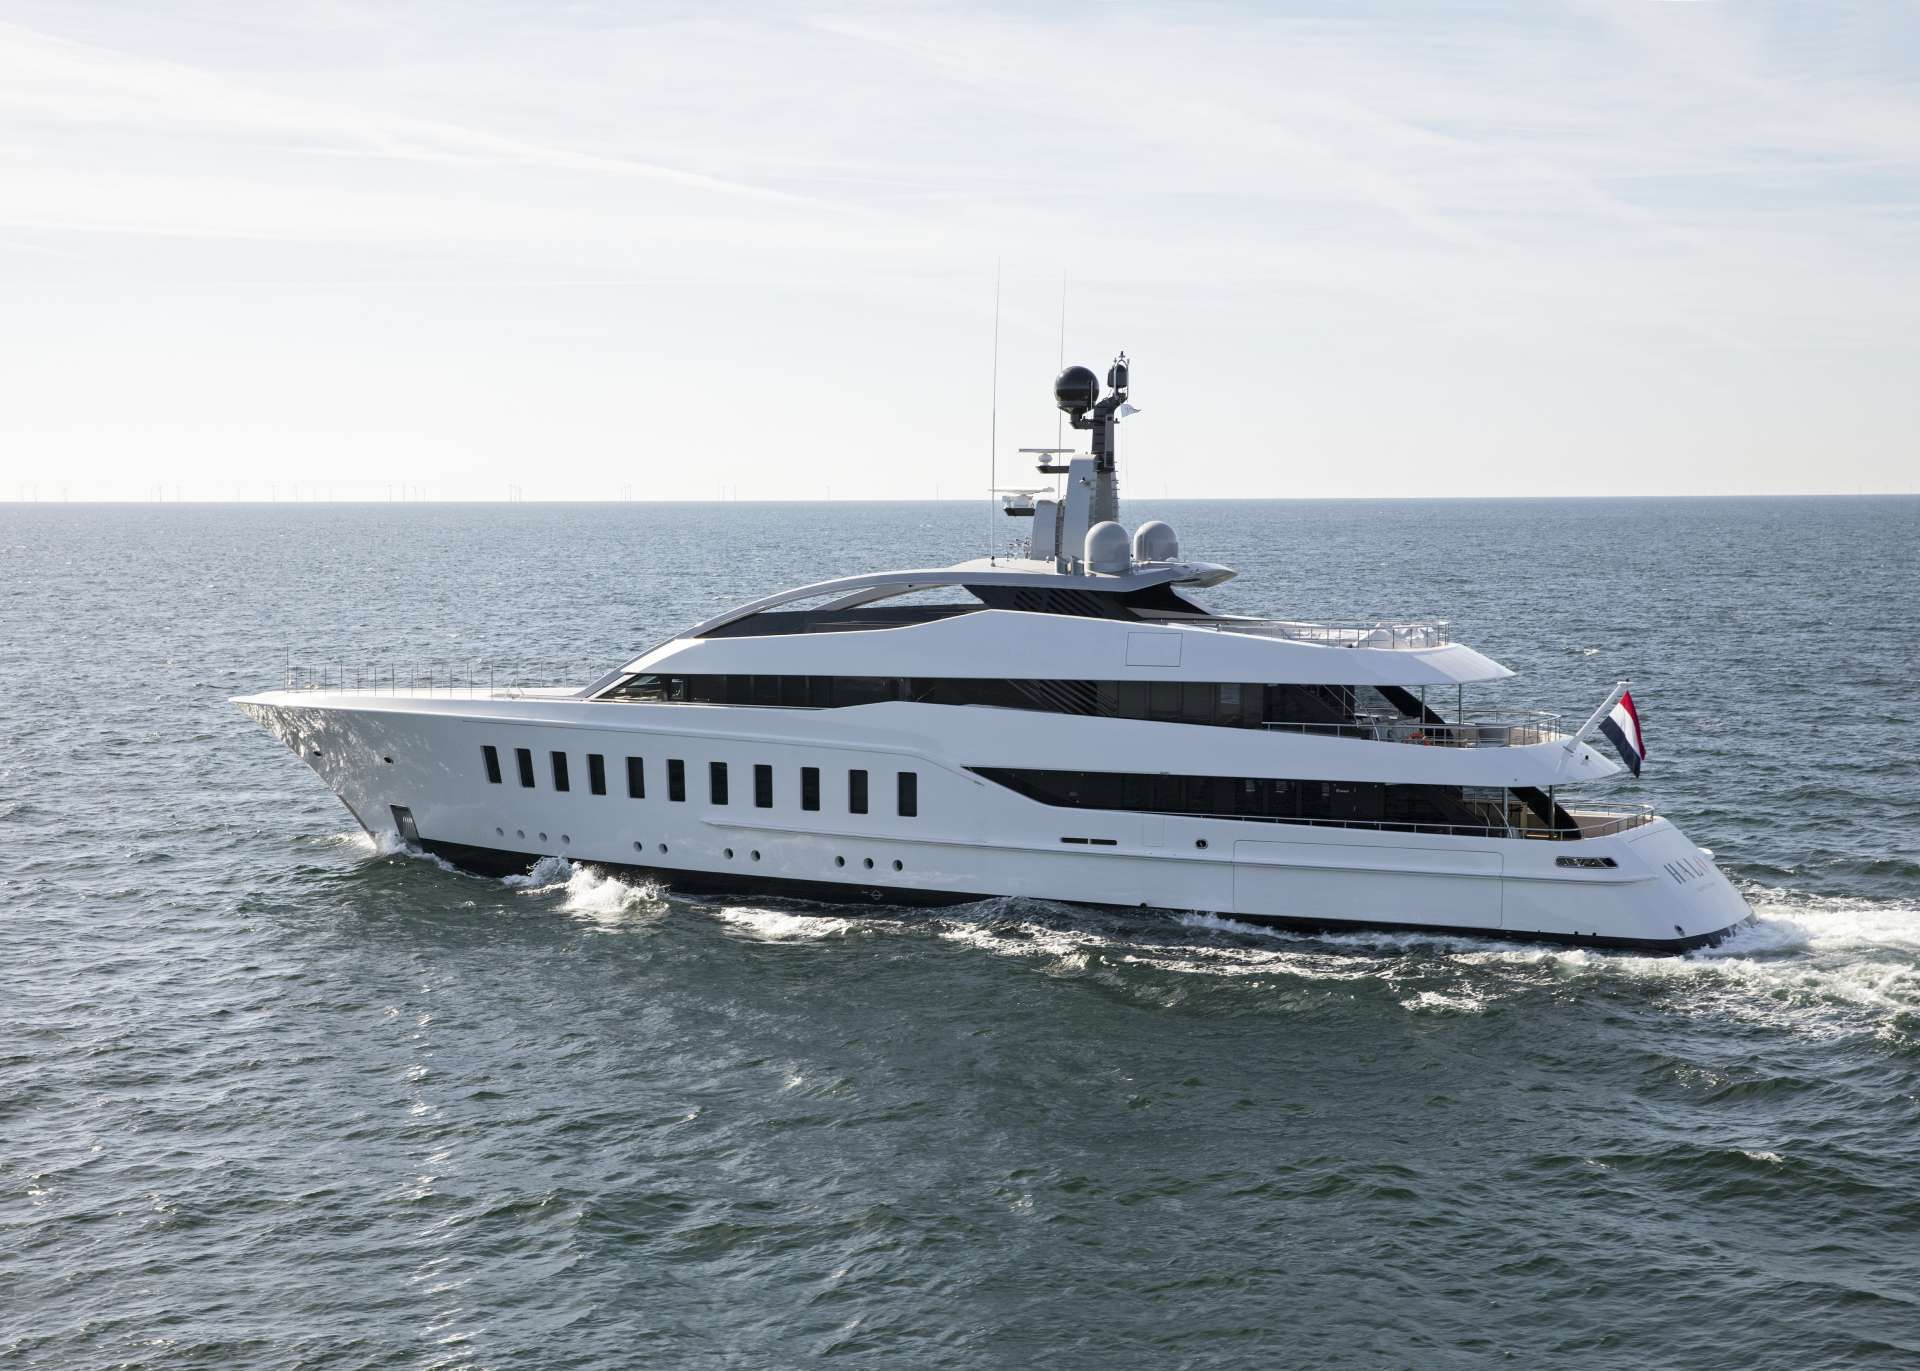 Halo - Feadship Royal Dutch Shipyards